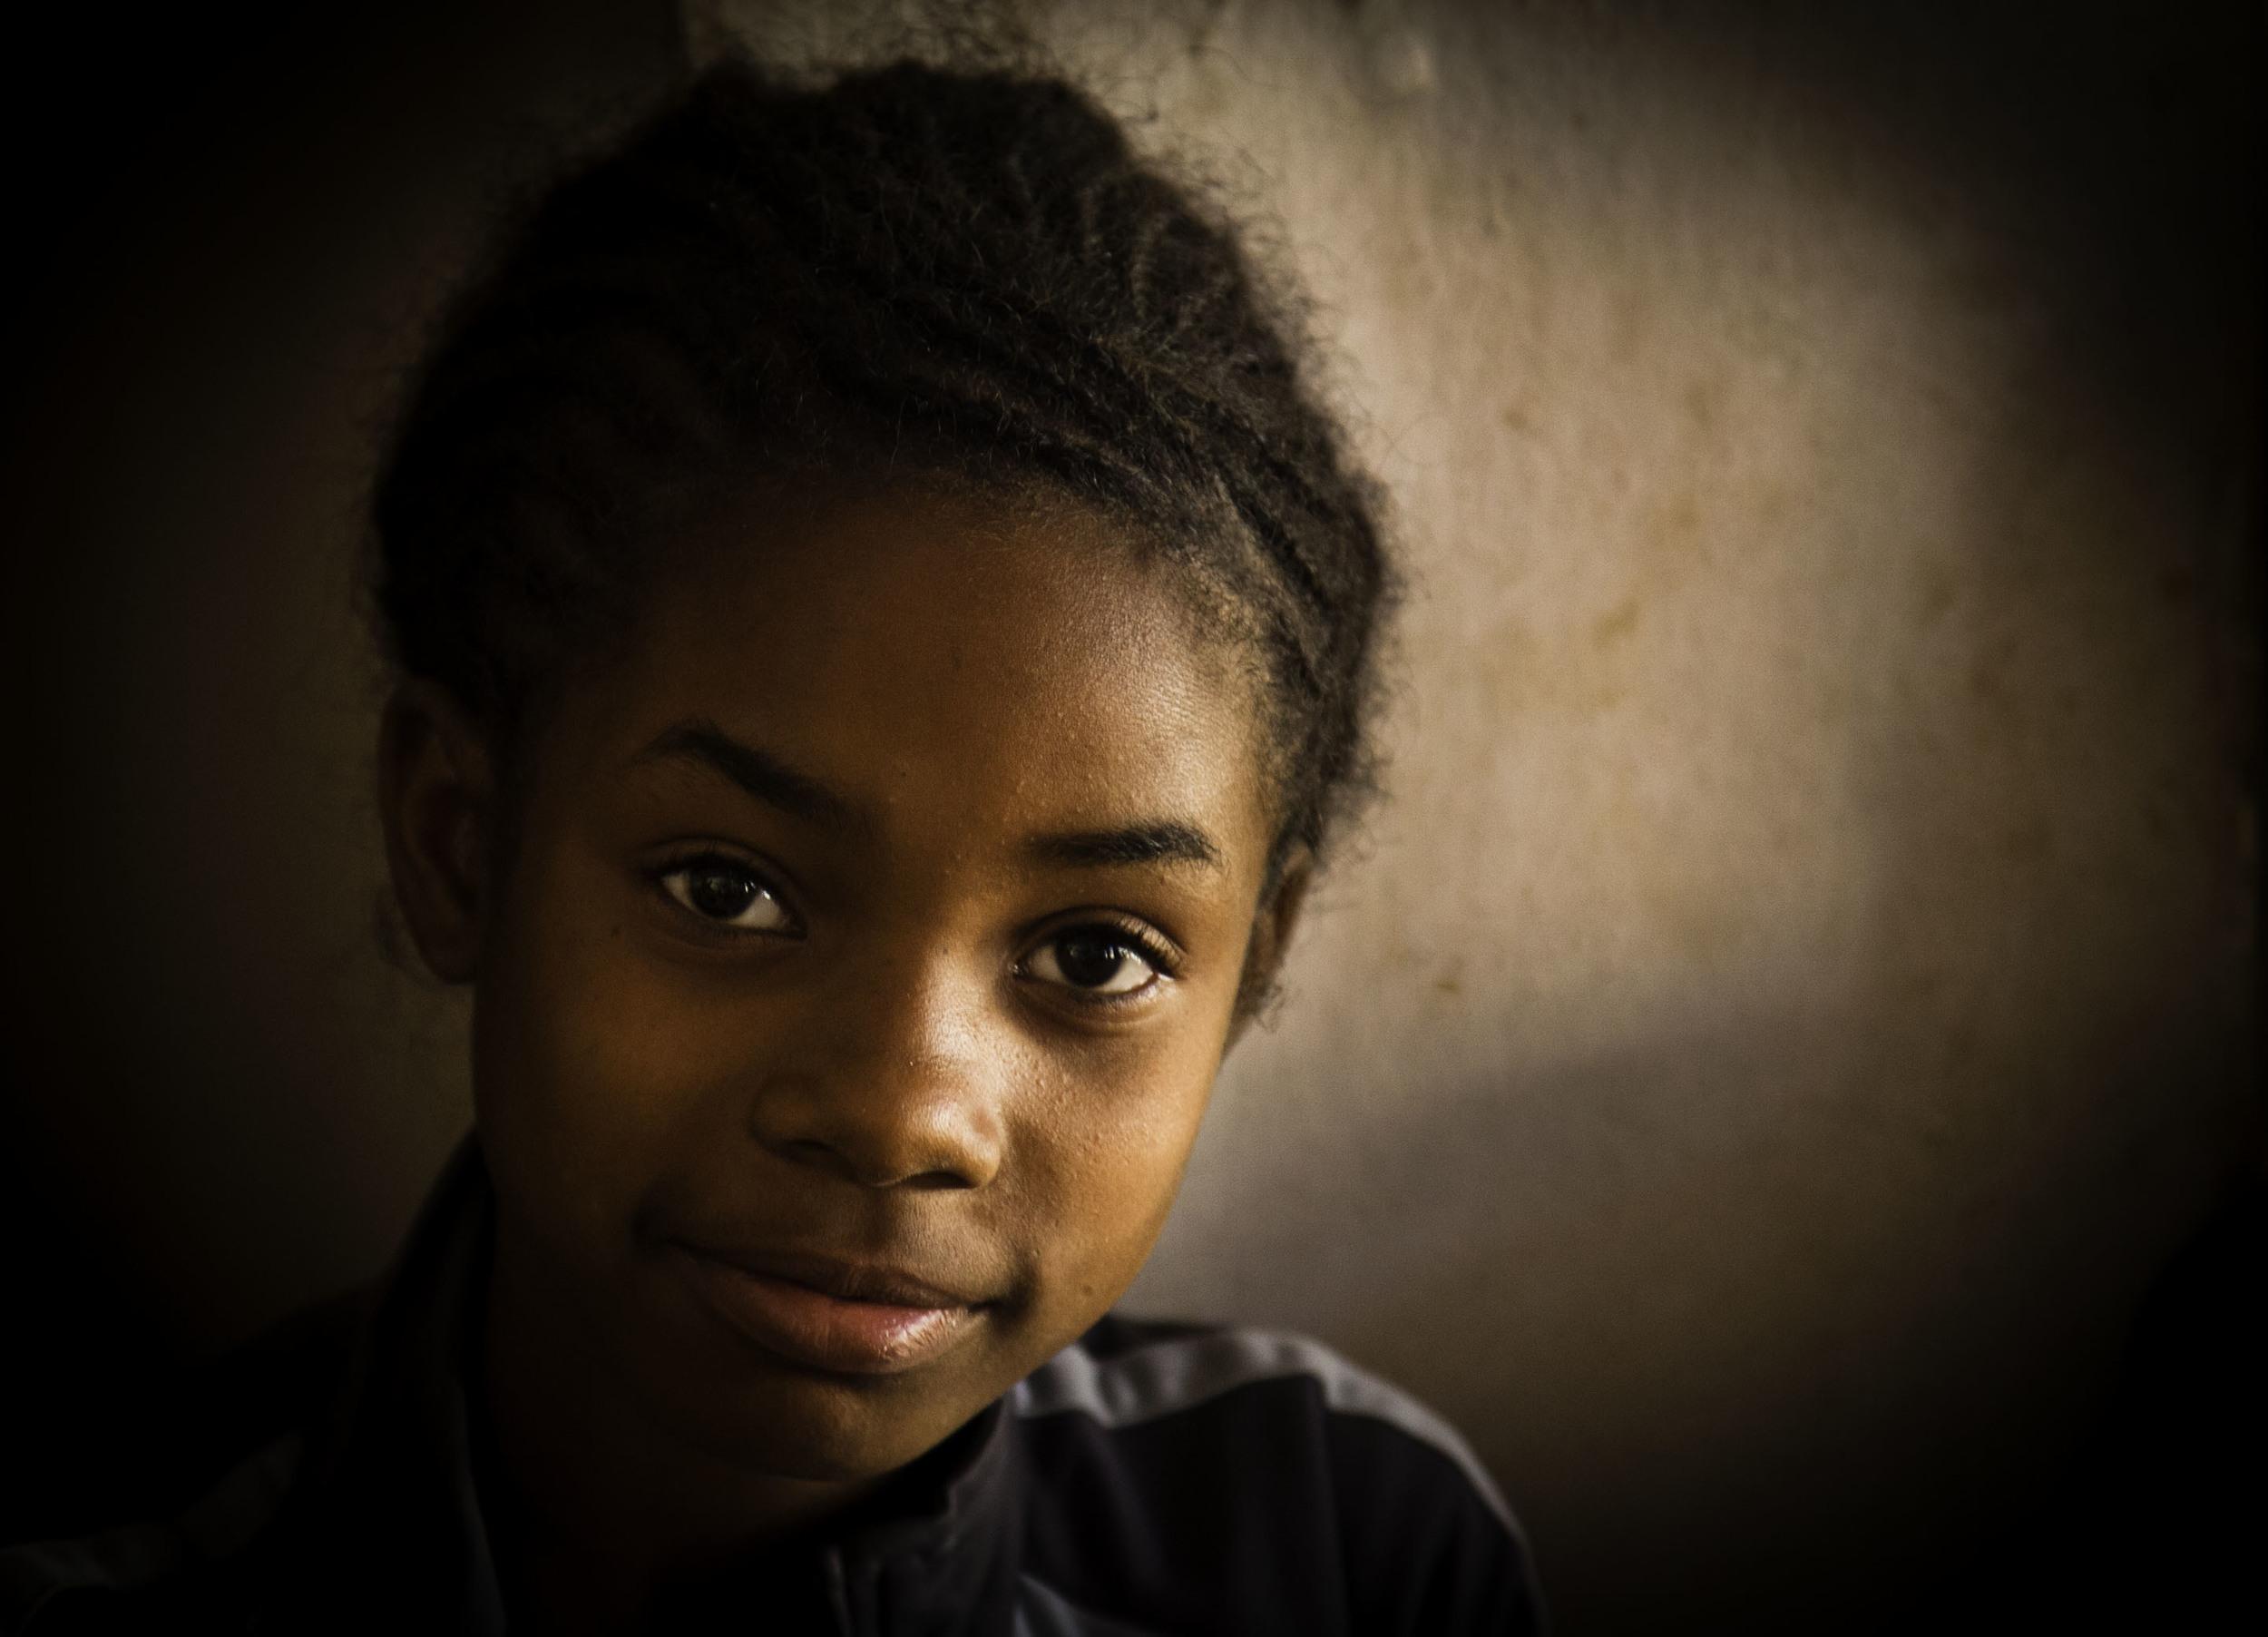 Ginna_Portrait of a Girl.jpg